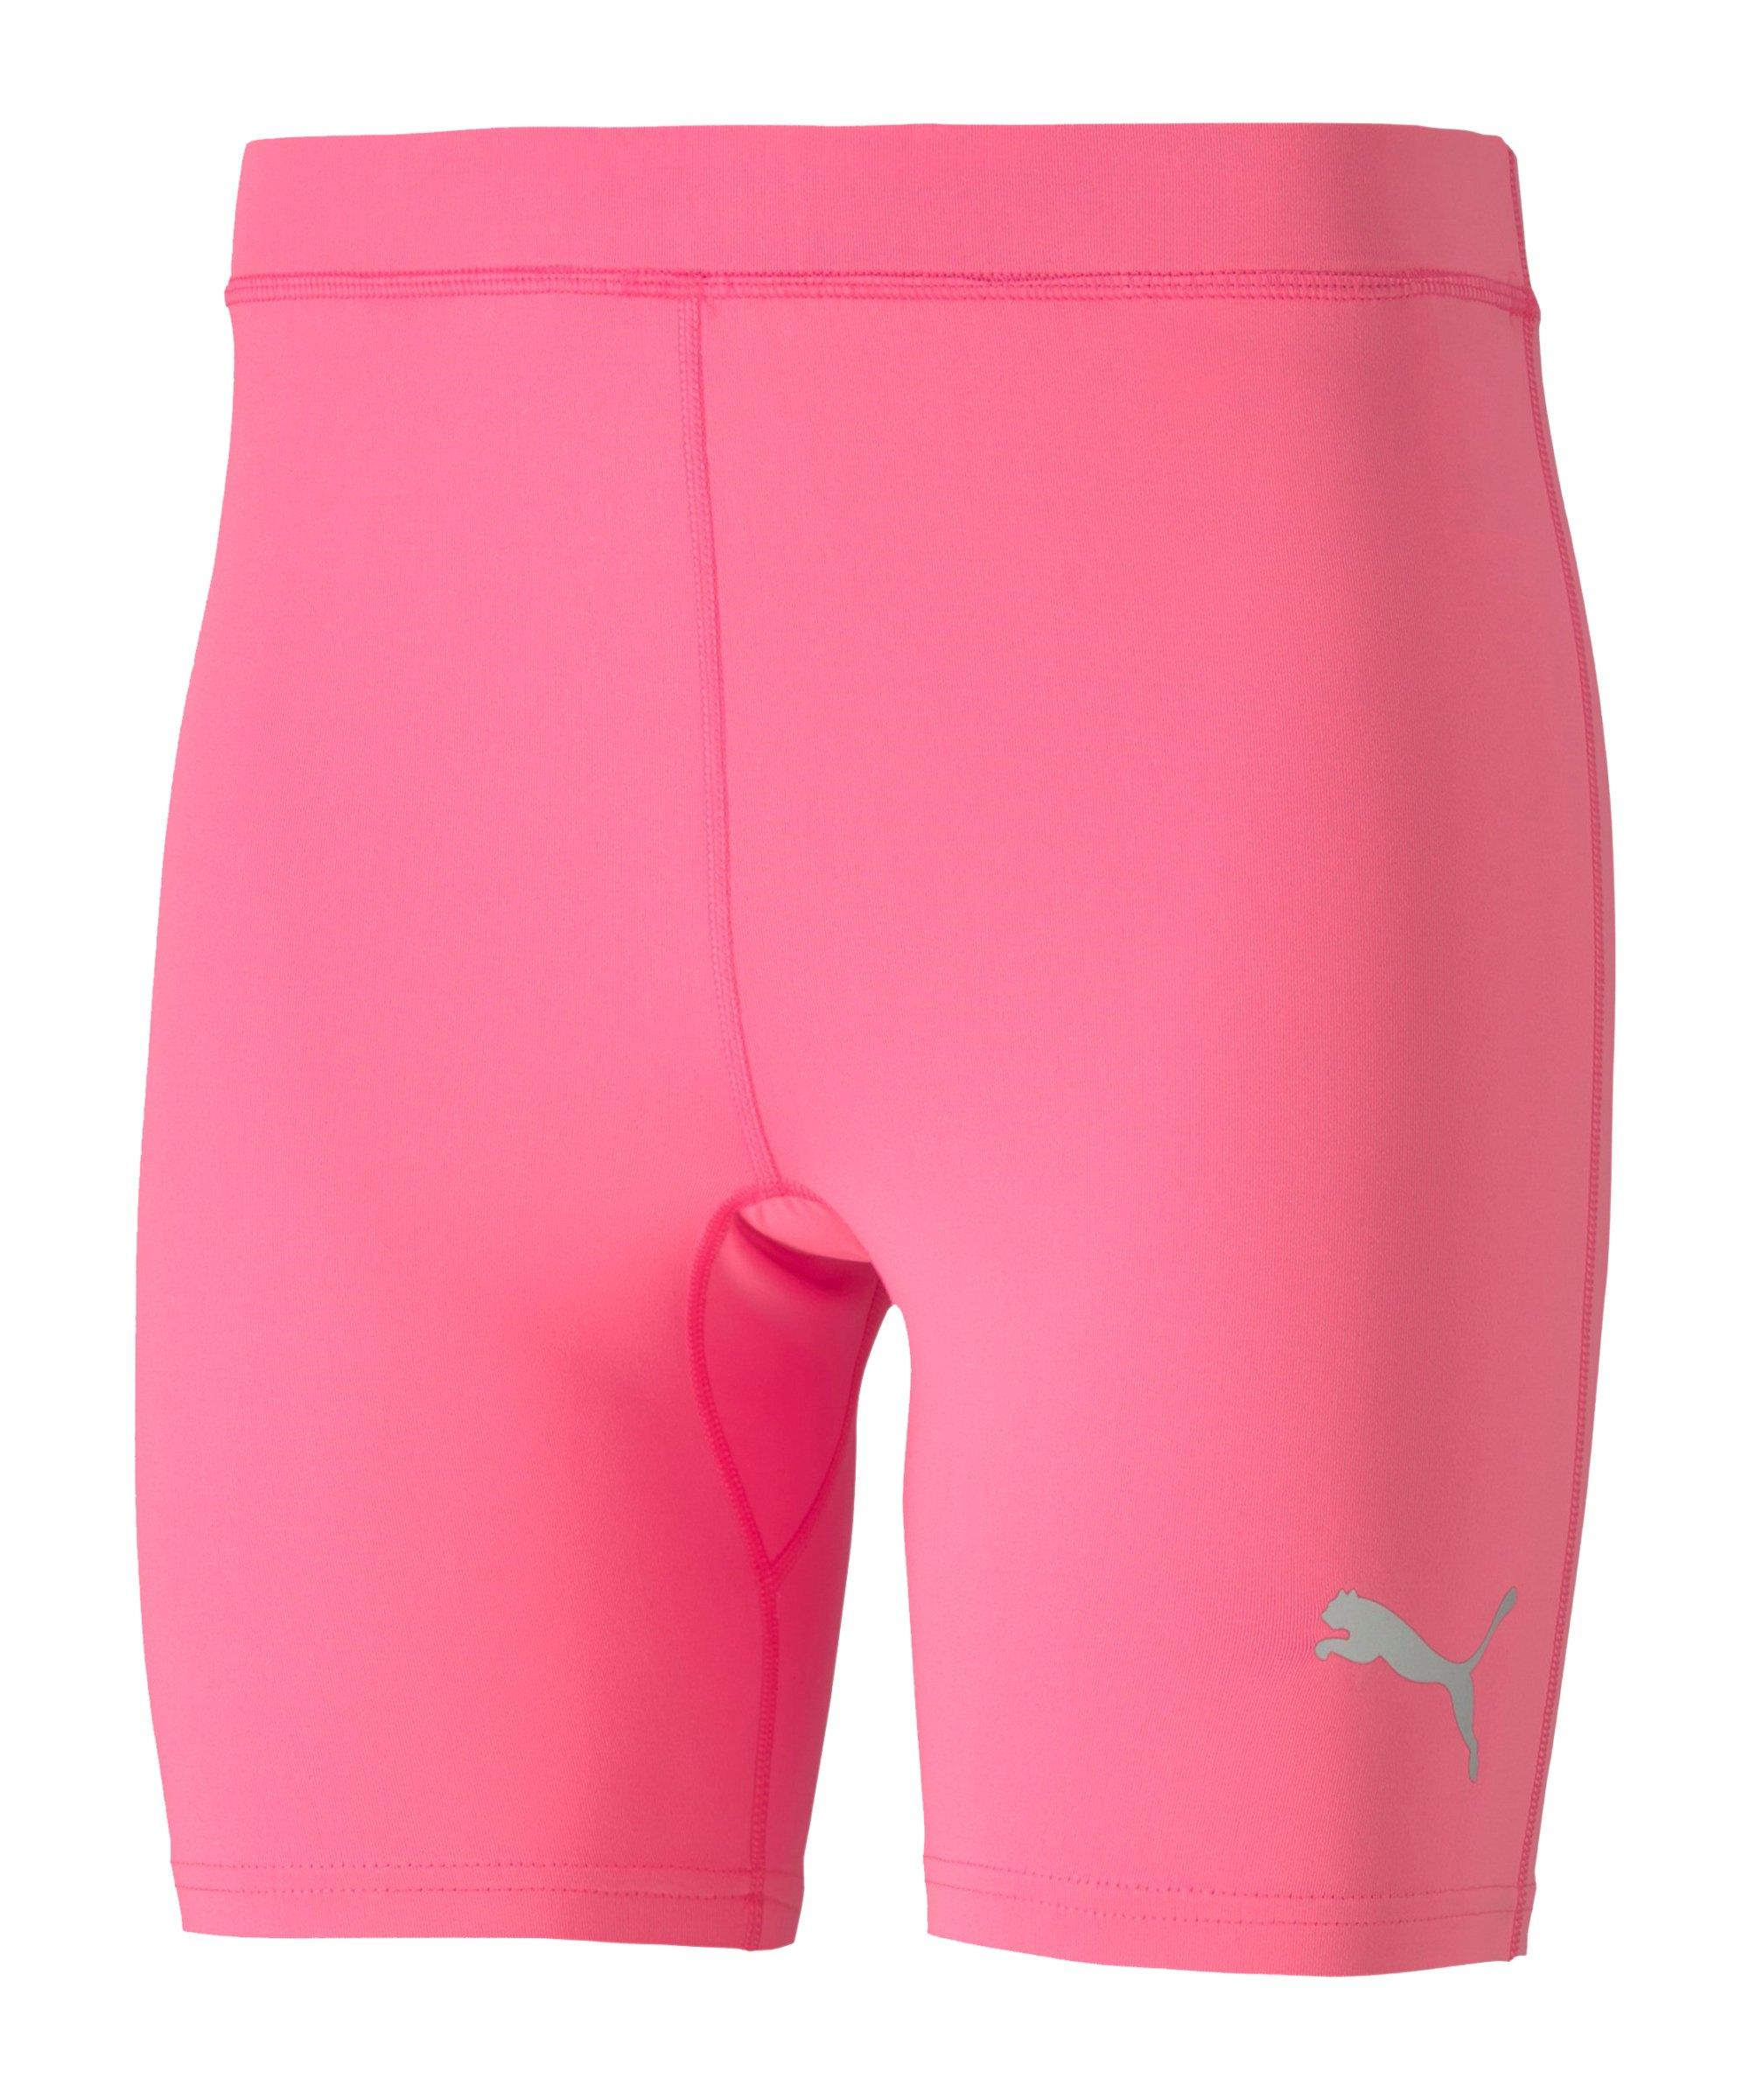 PUMA LIGA Baselayer Short Pink F29 - pink